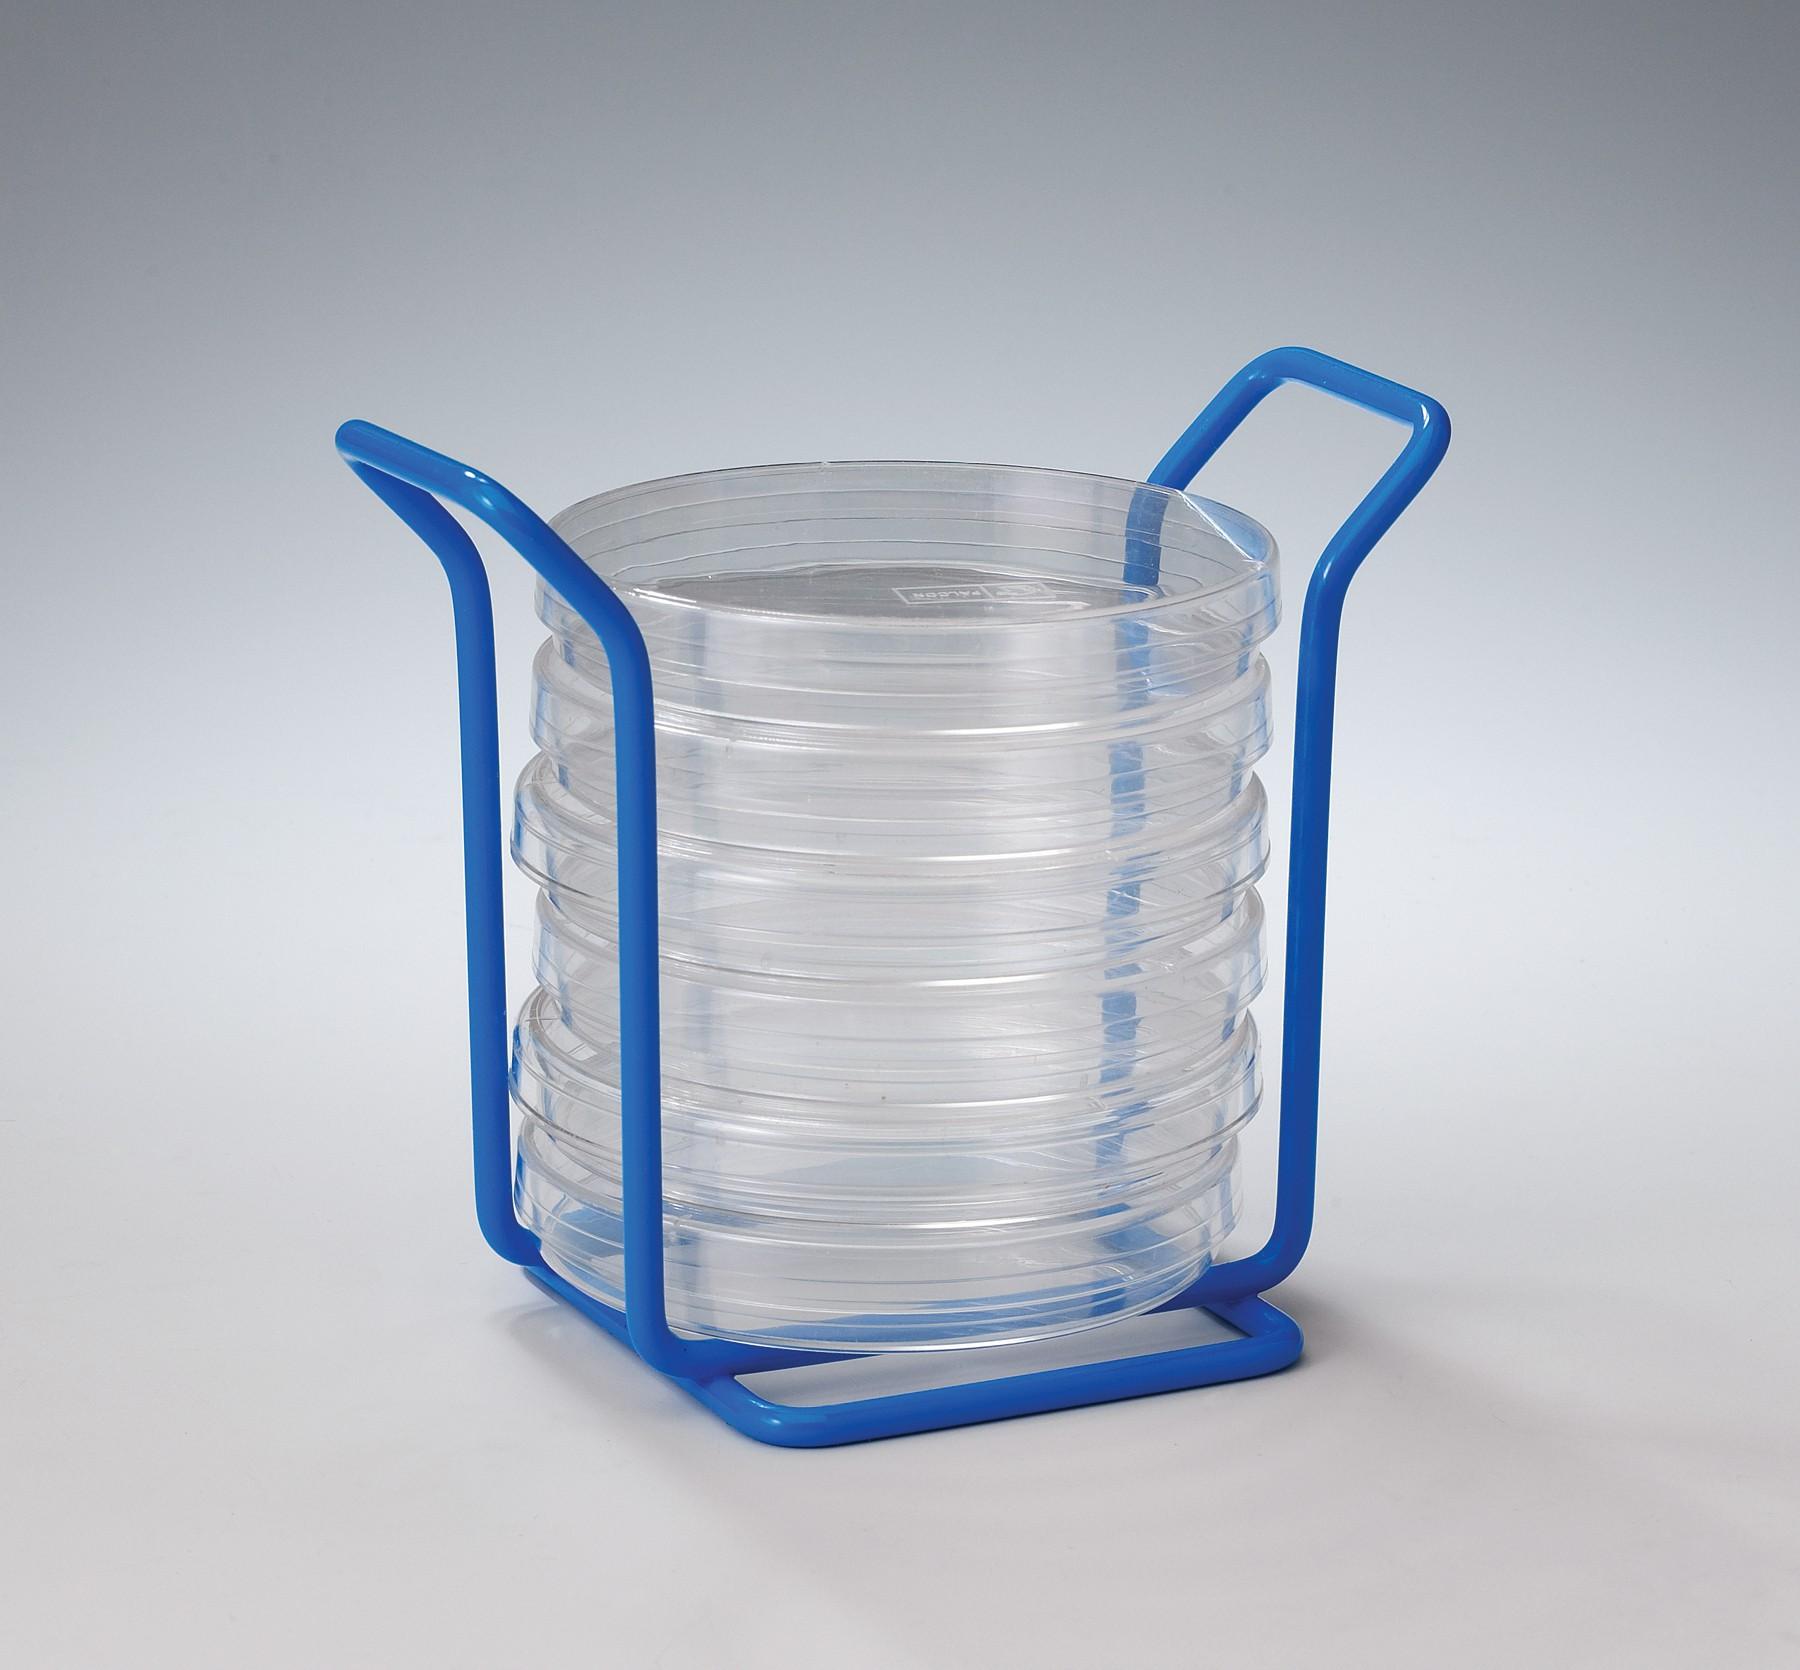 100mm Petri Dish Mini Rack Poxygrid Default Store View